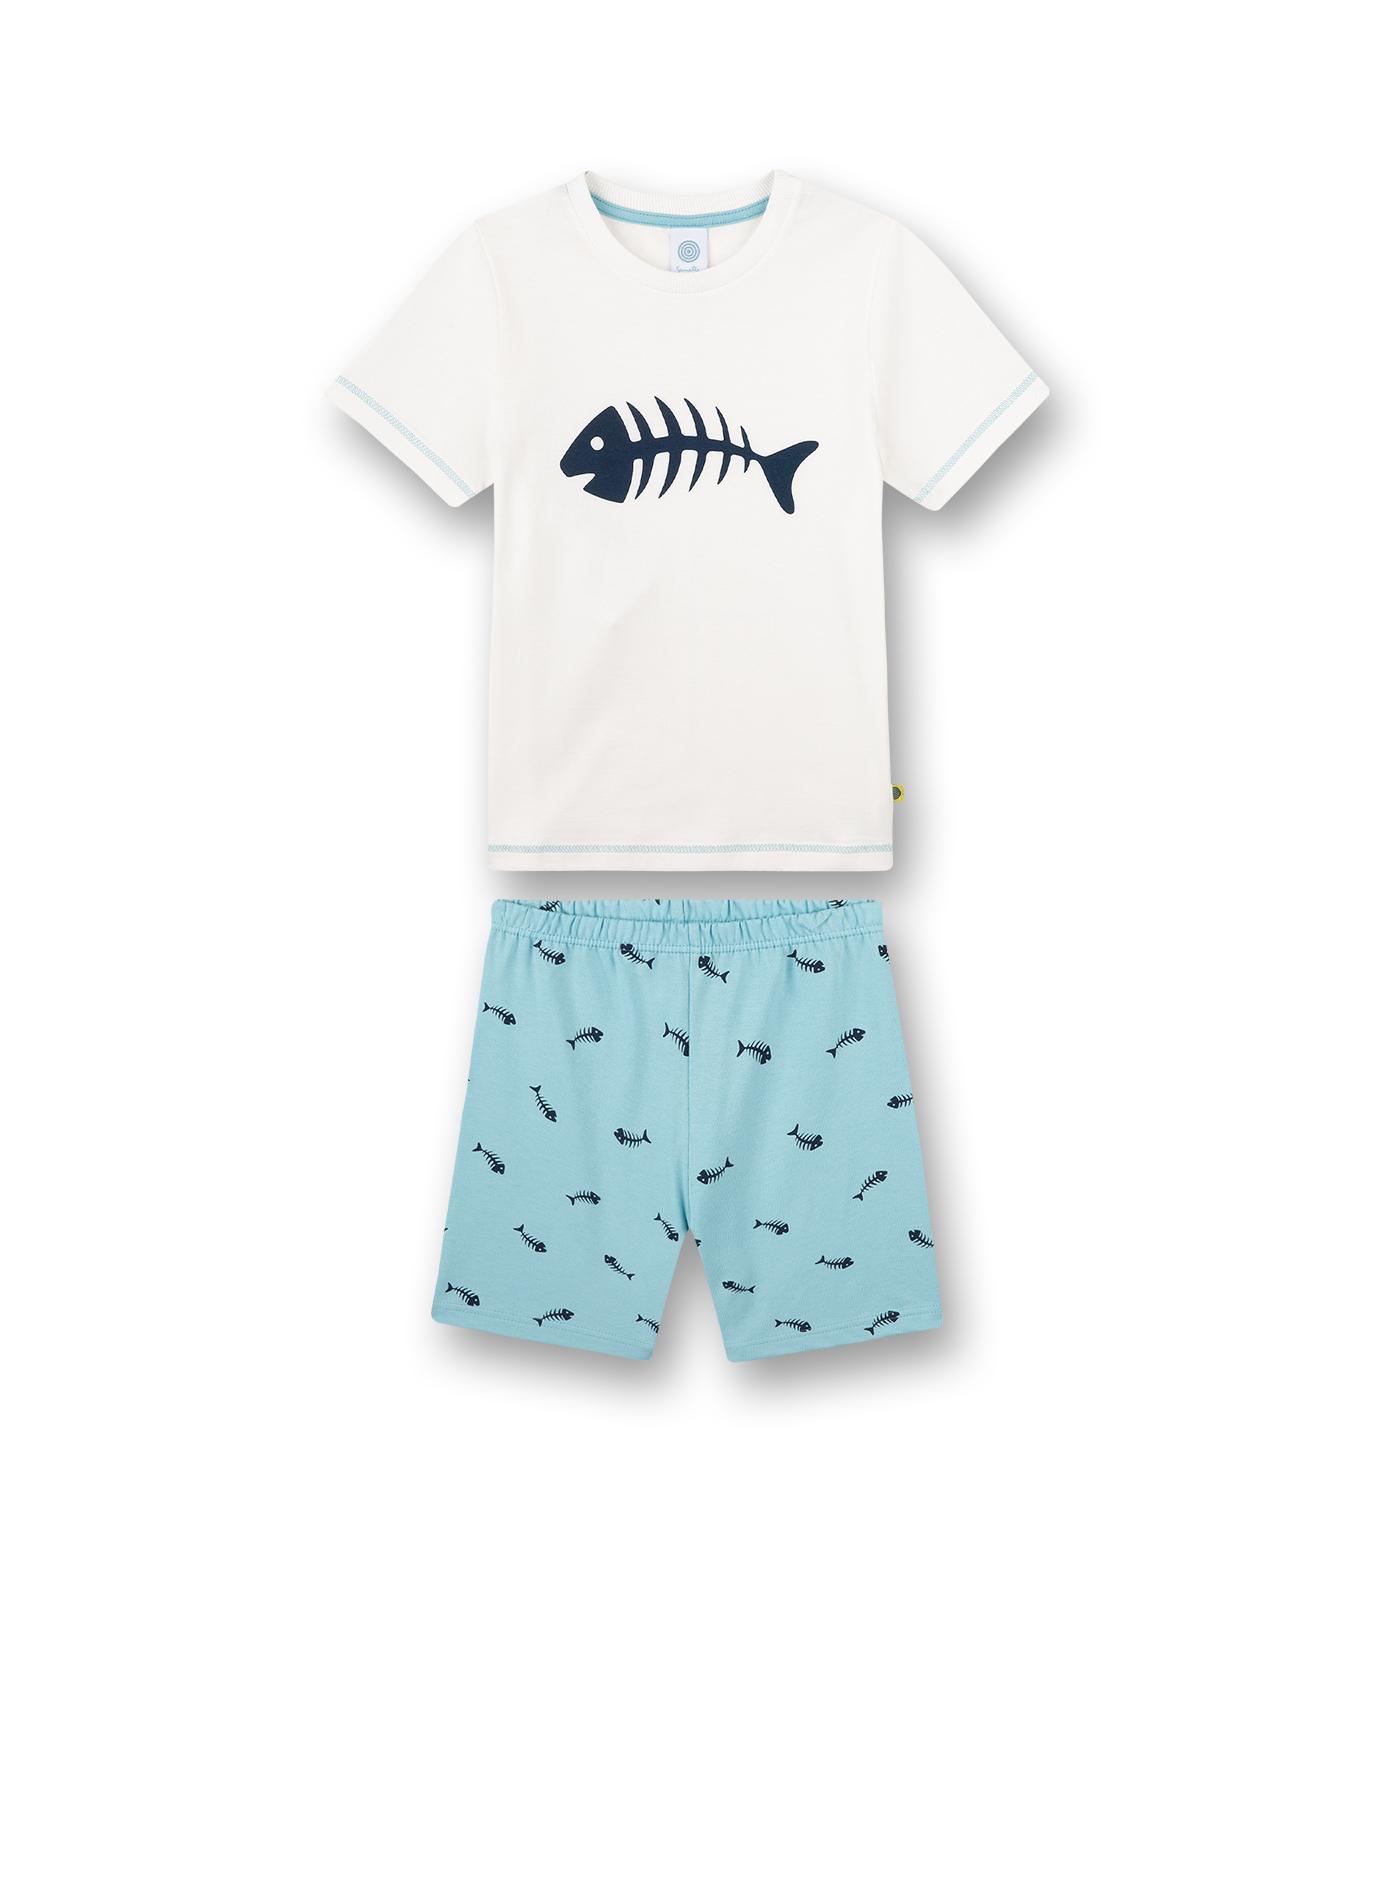 Pyjama short 098 white pebble Sanetta